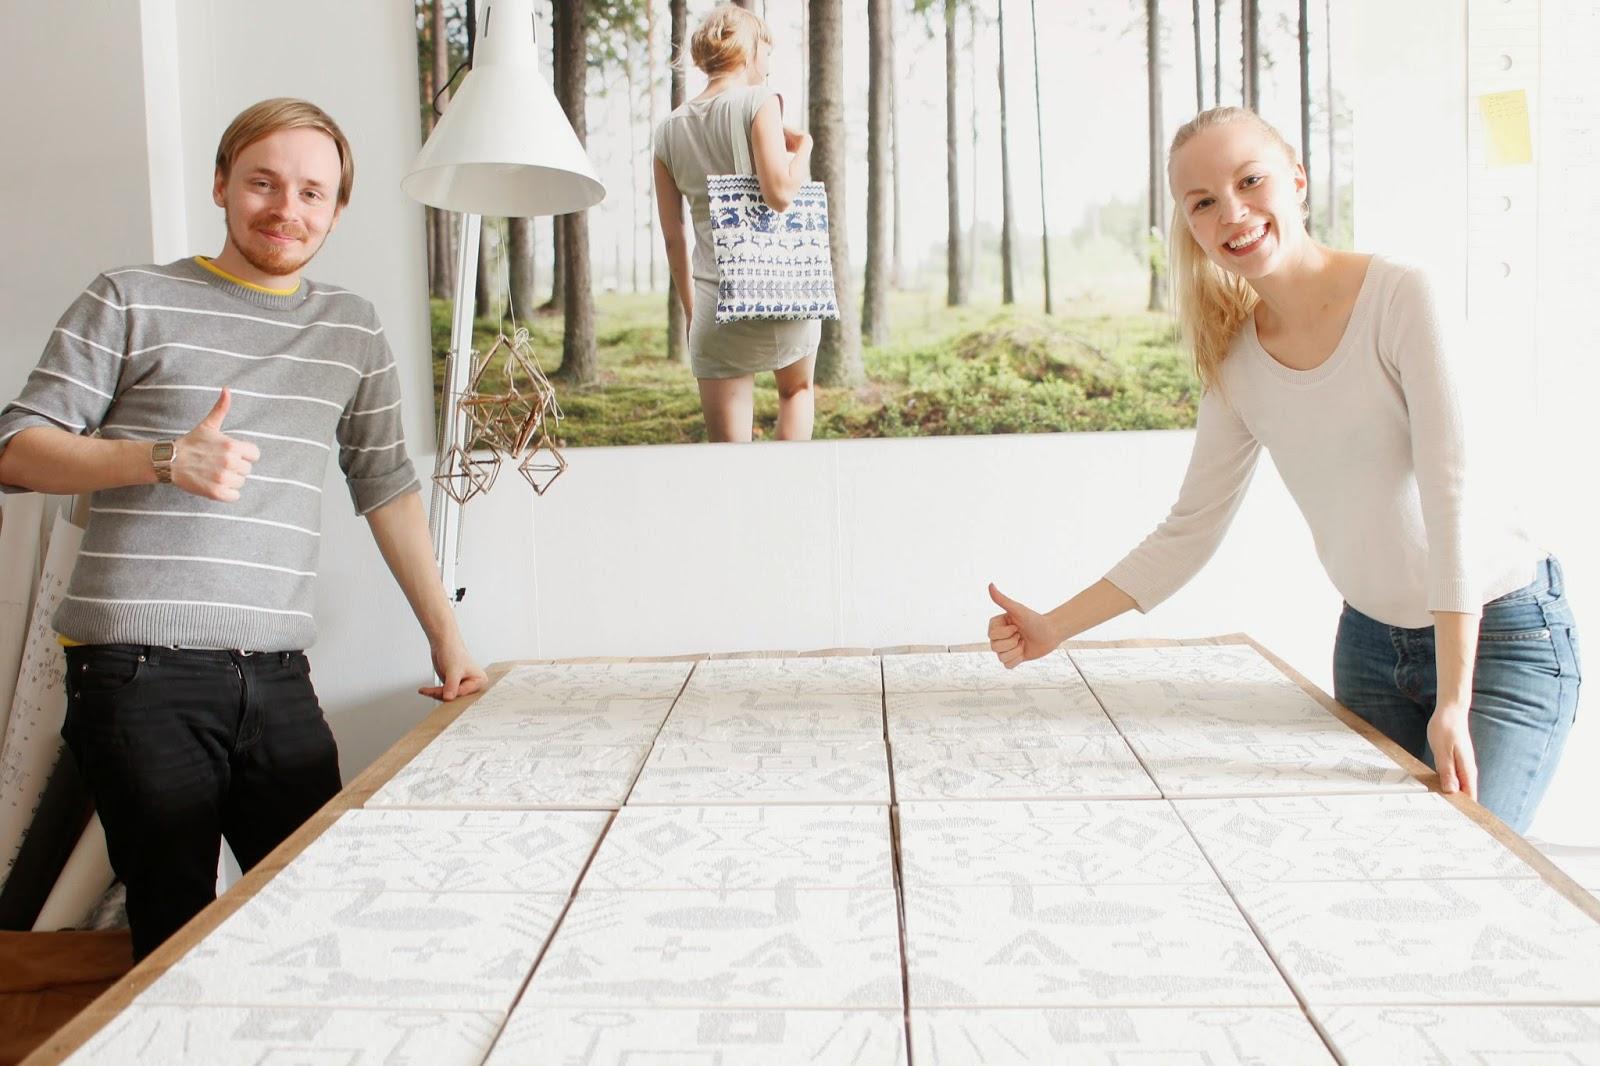 Saana Ja Olli : Keloranta laatat by saana ja olli